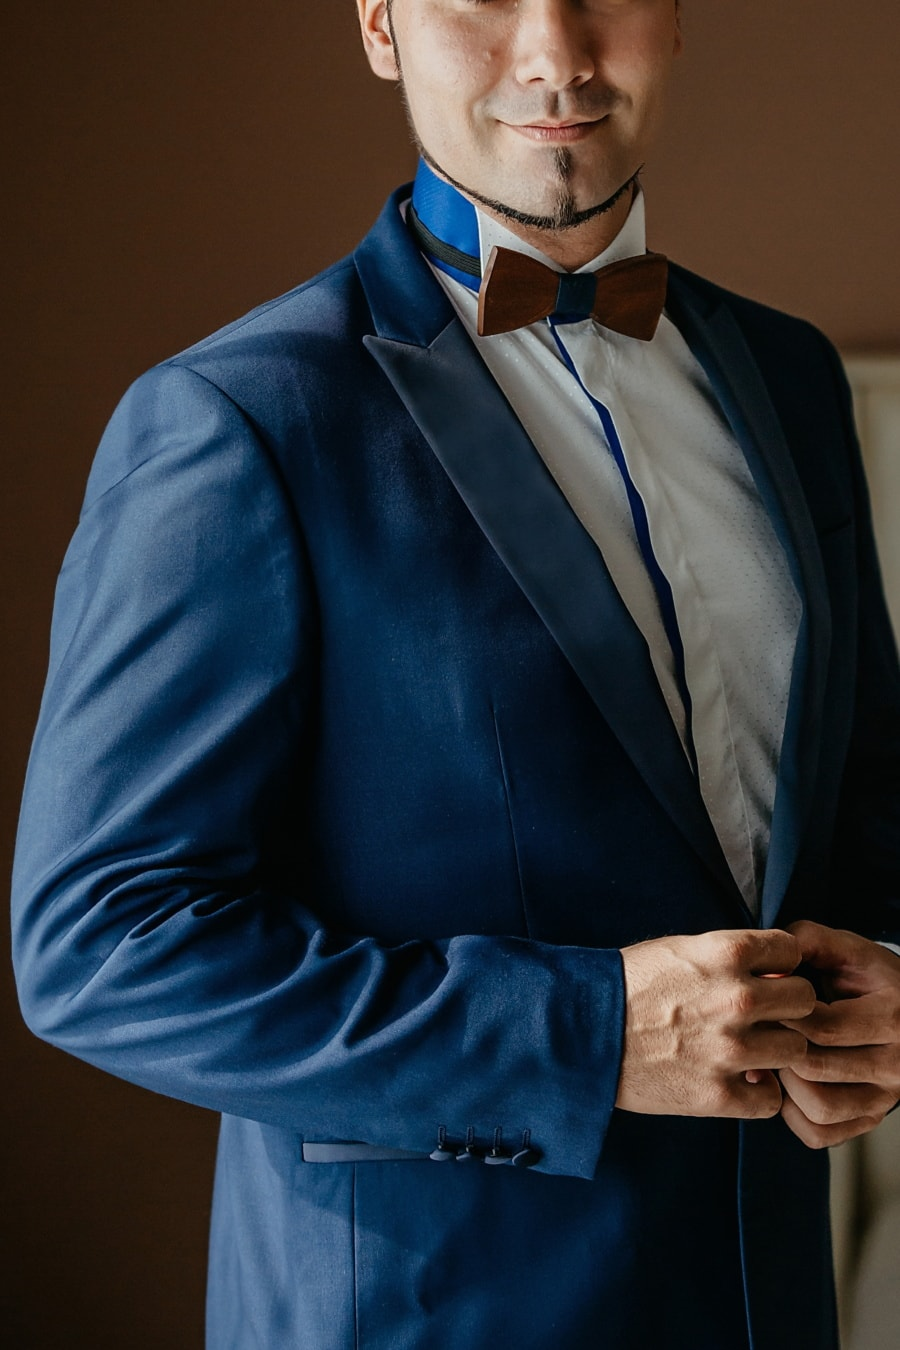 bowtie, tuxedo suit, handsome, photo model, confidence, pride, man, business, clothing, garment